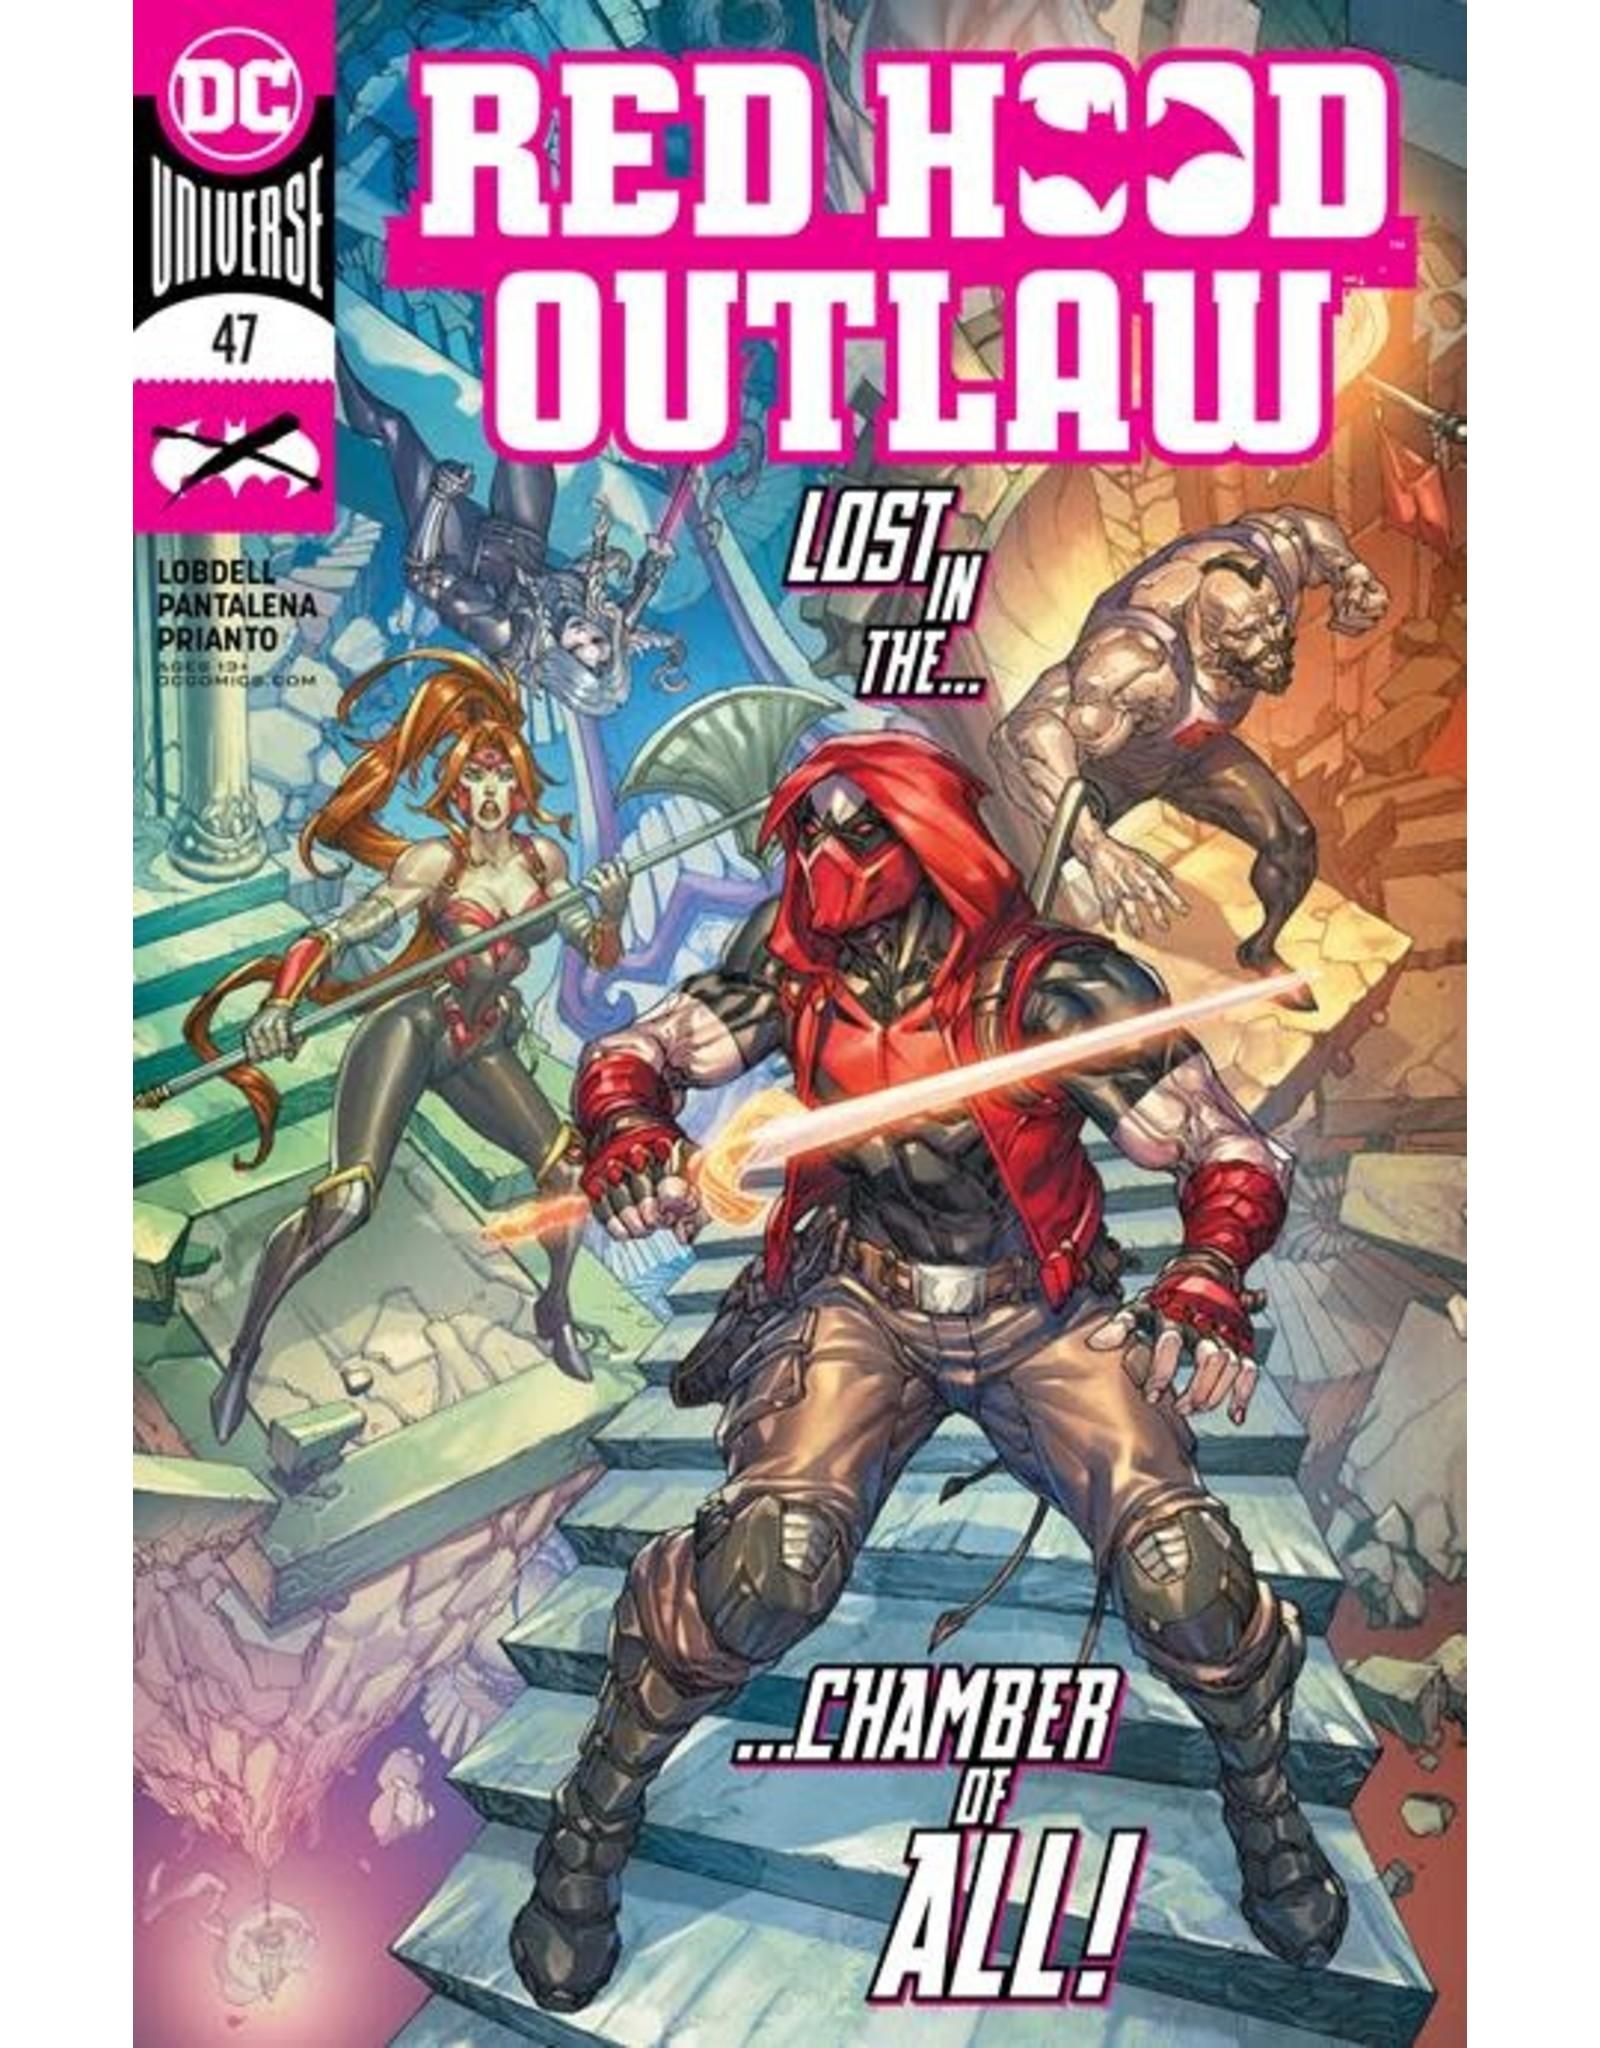 DC COMICS RED HOOD OUTLAW #47